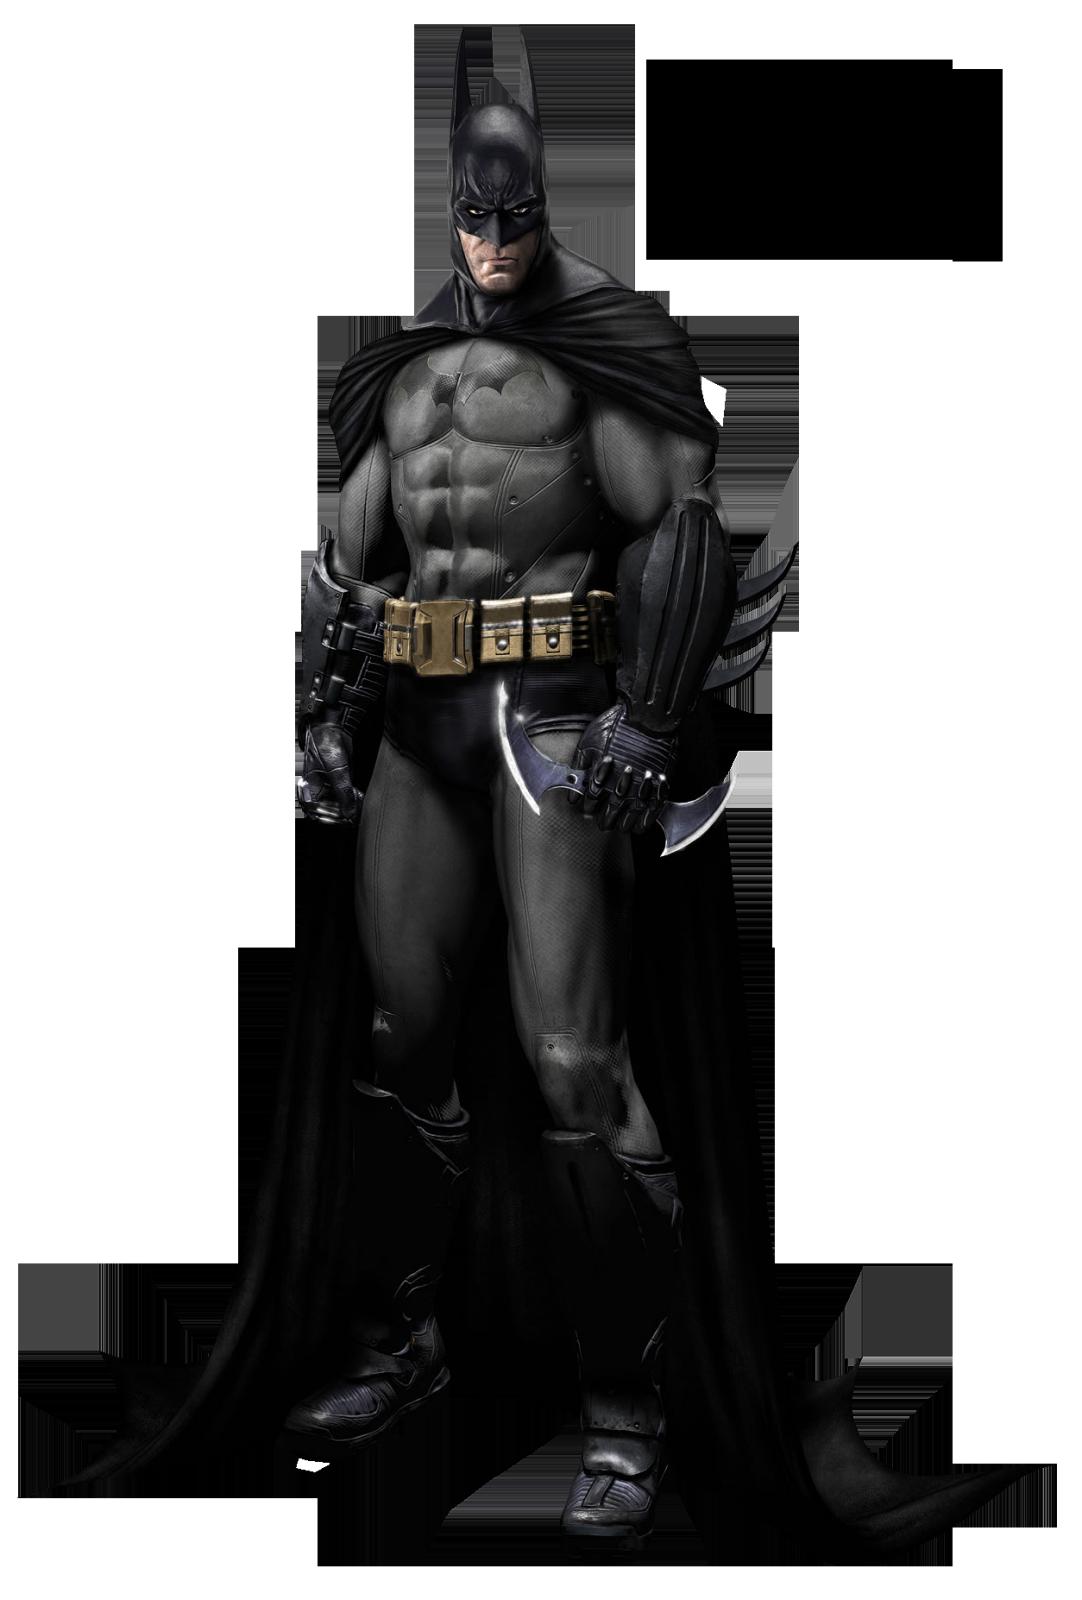 Pin By Kushalagarwal On Just Batman Arkham Asylum Batman Arkham City Batman Arkham Asylum